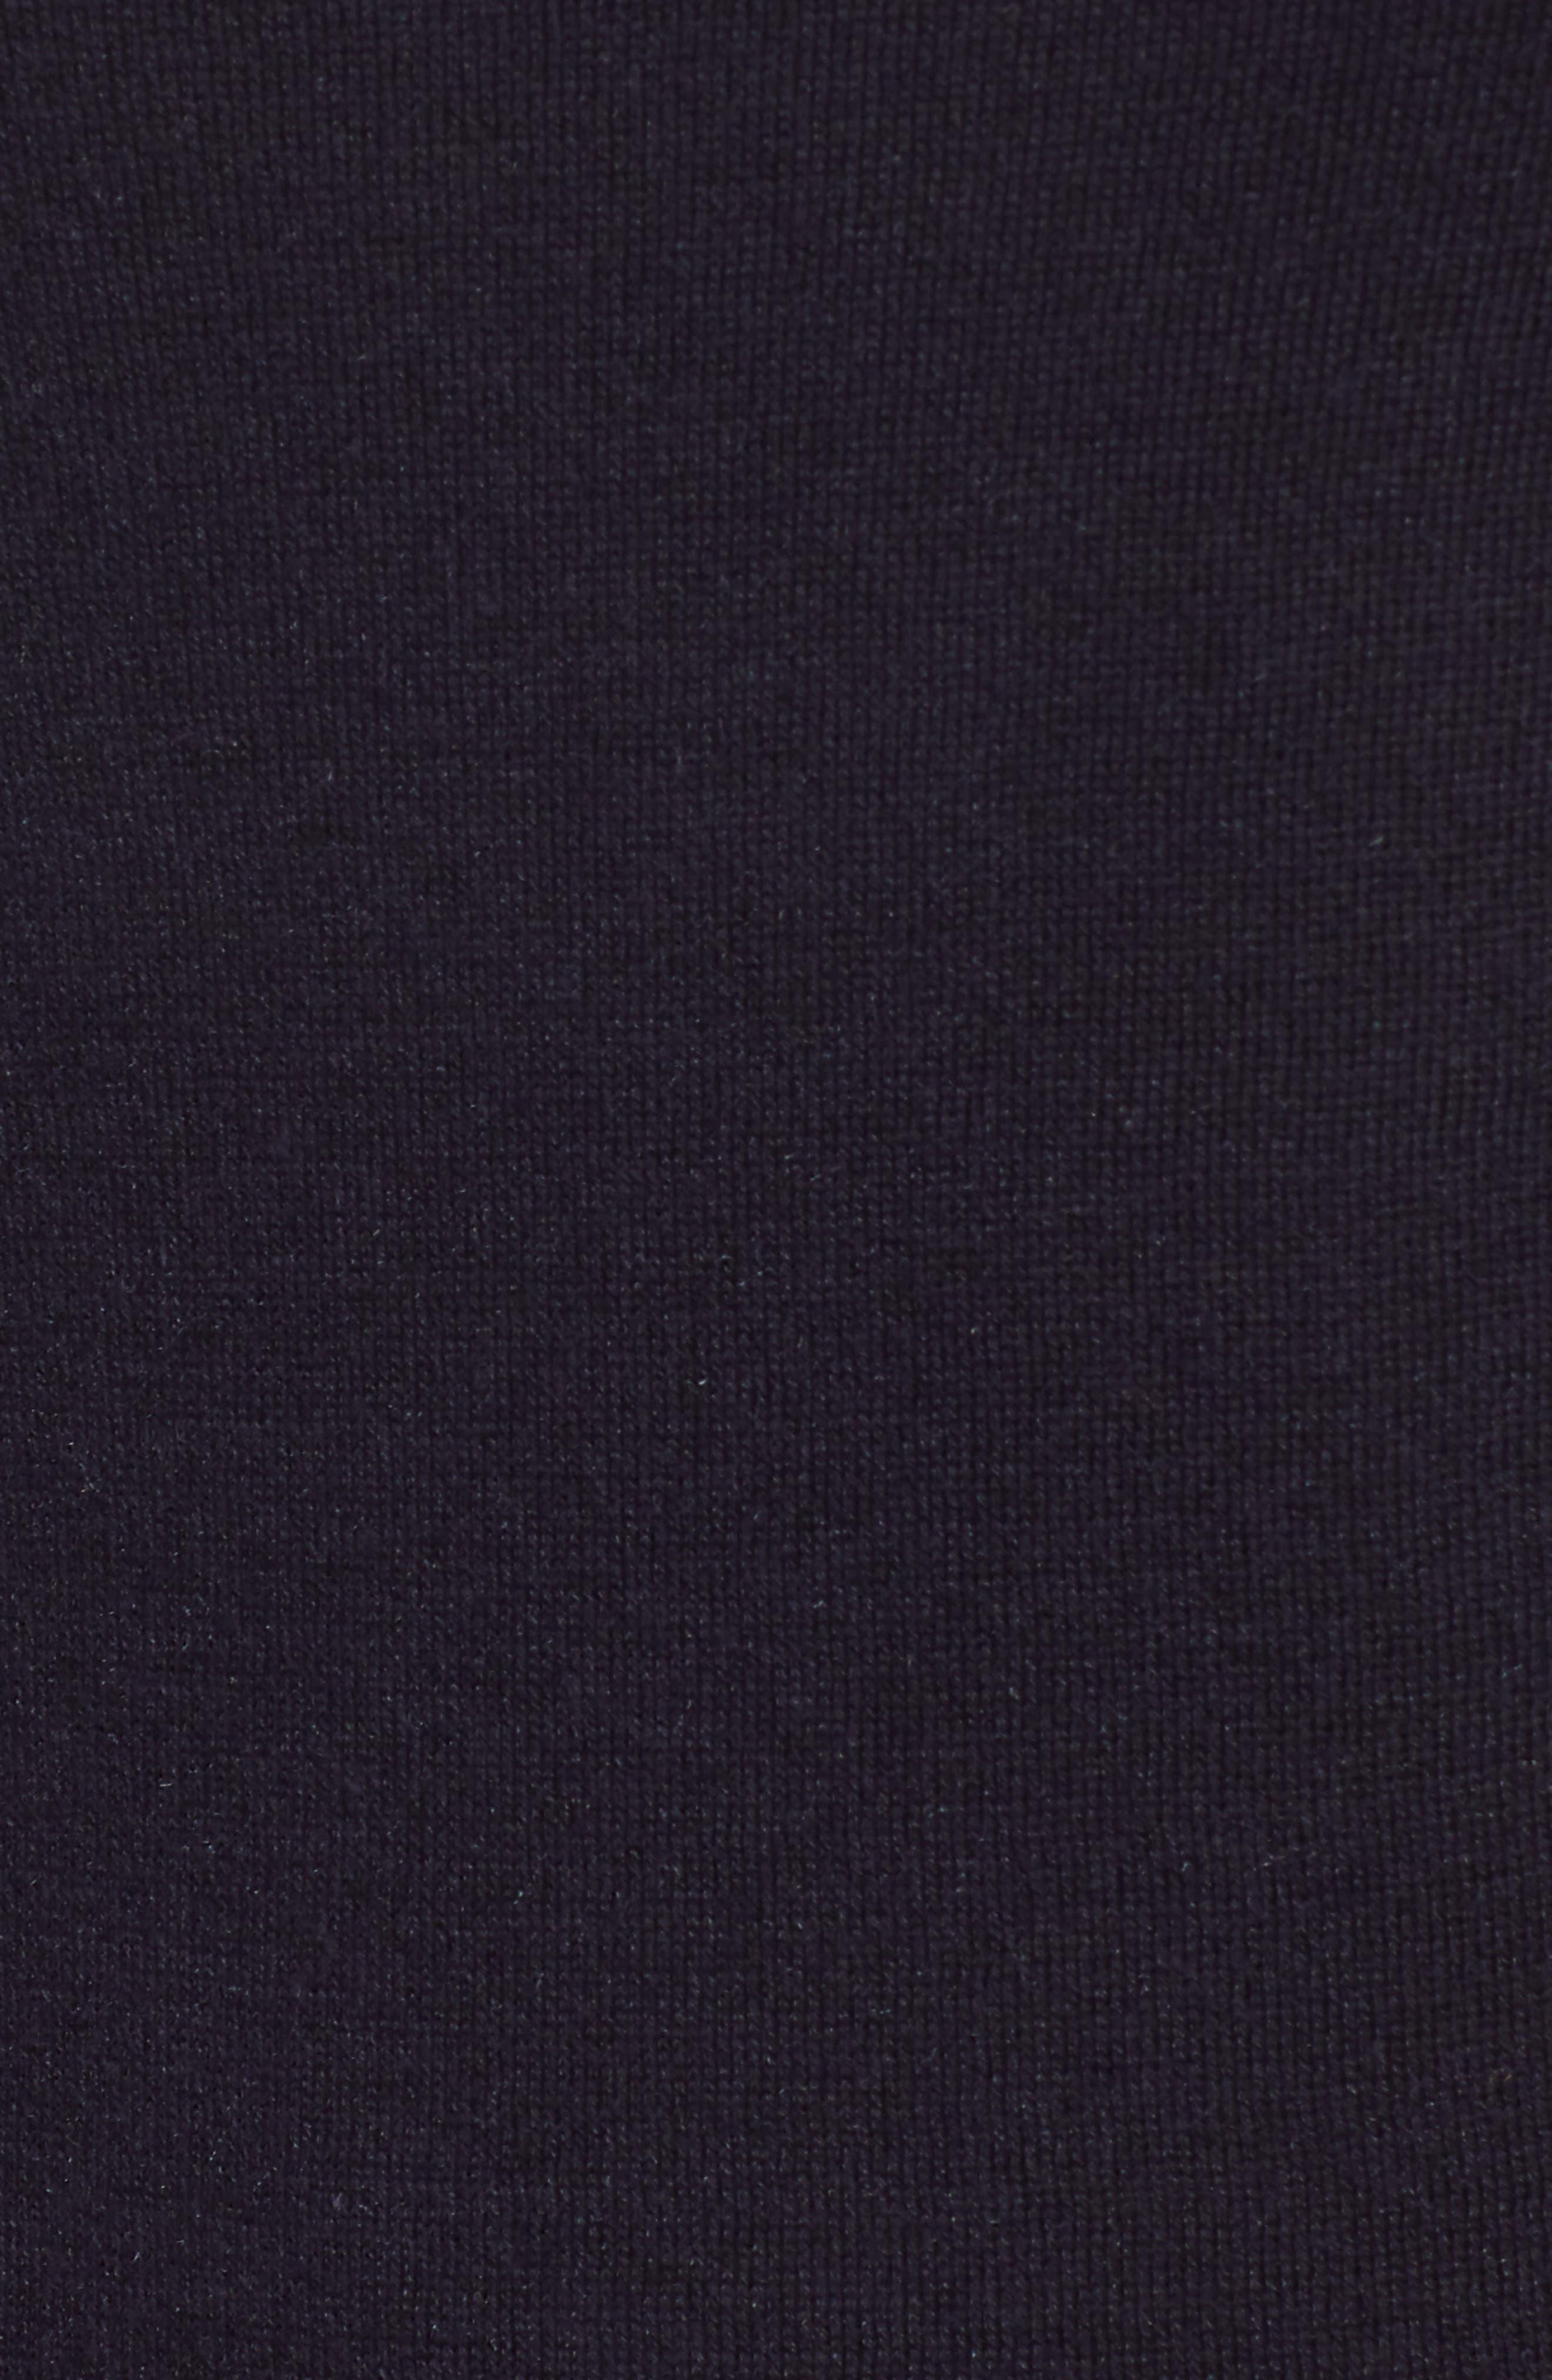 Cotton Blend Pullover,                             Alternate thumbnail 124, color,